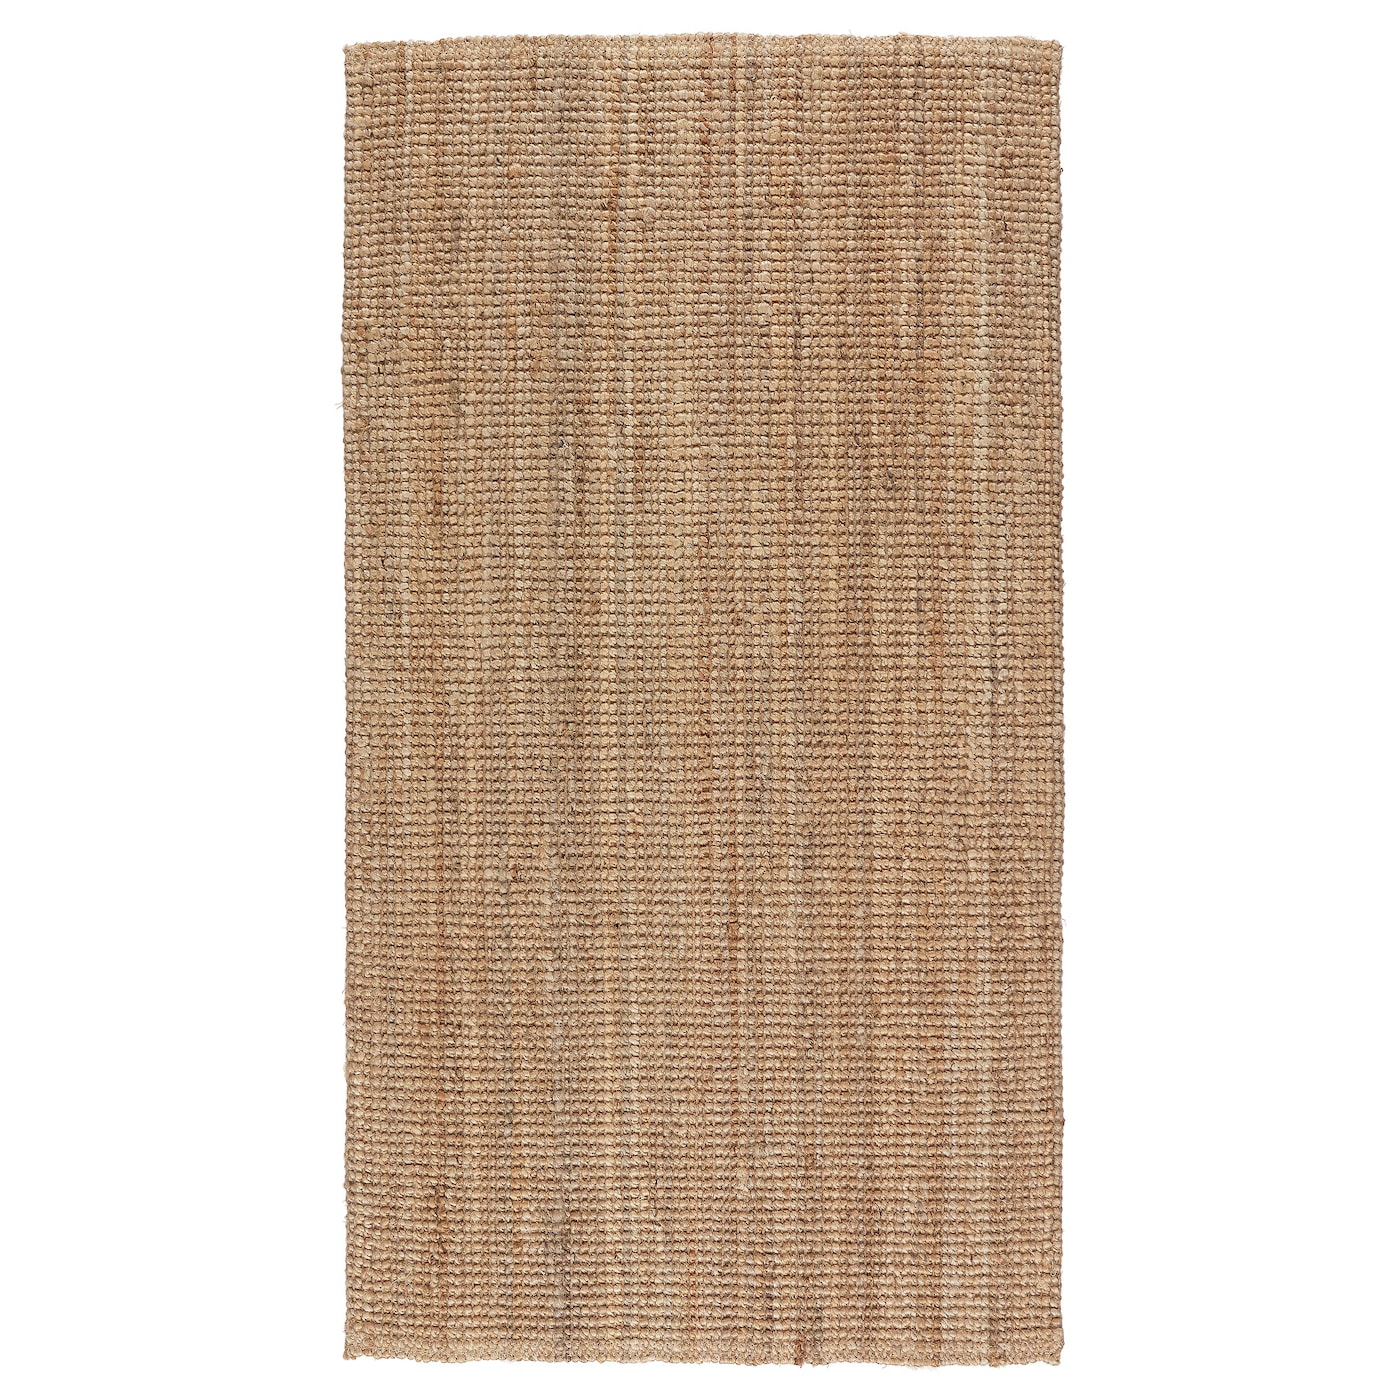 lohals tapis tiss plat naturel 80x150 cm ikea. Black Bedroom Furniture Sets. Home Design Ideas